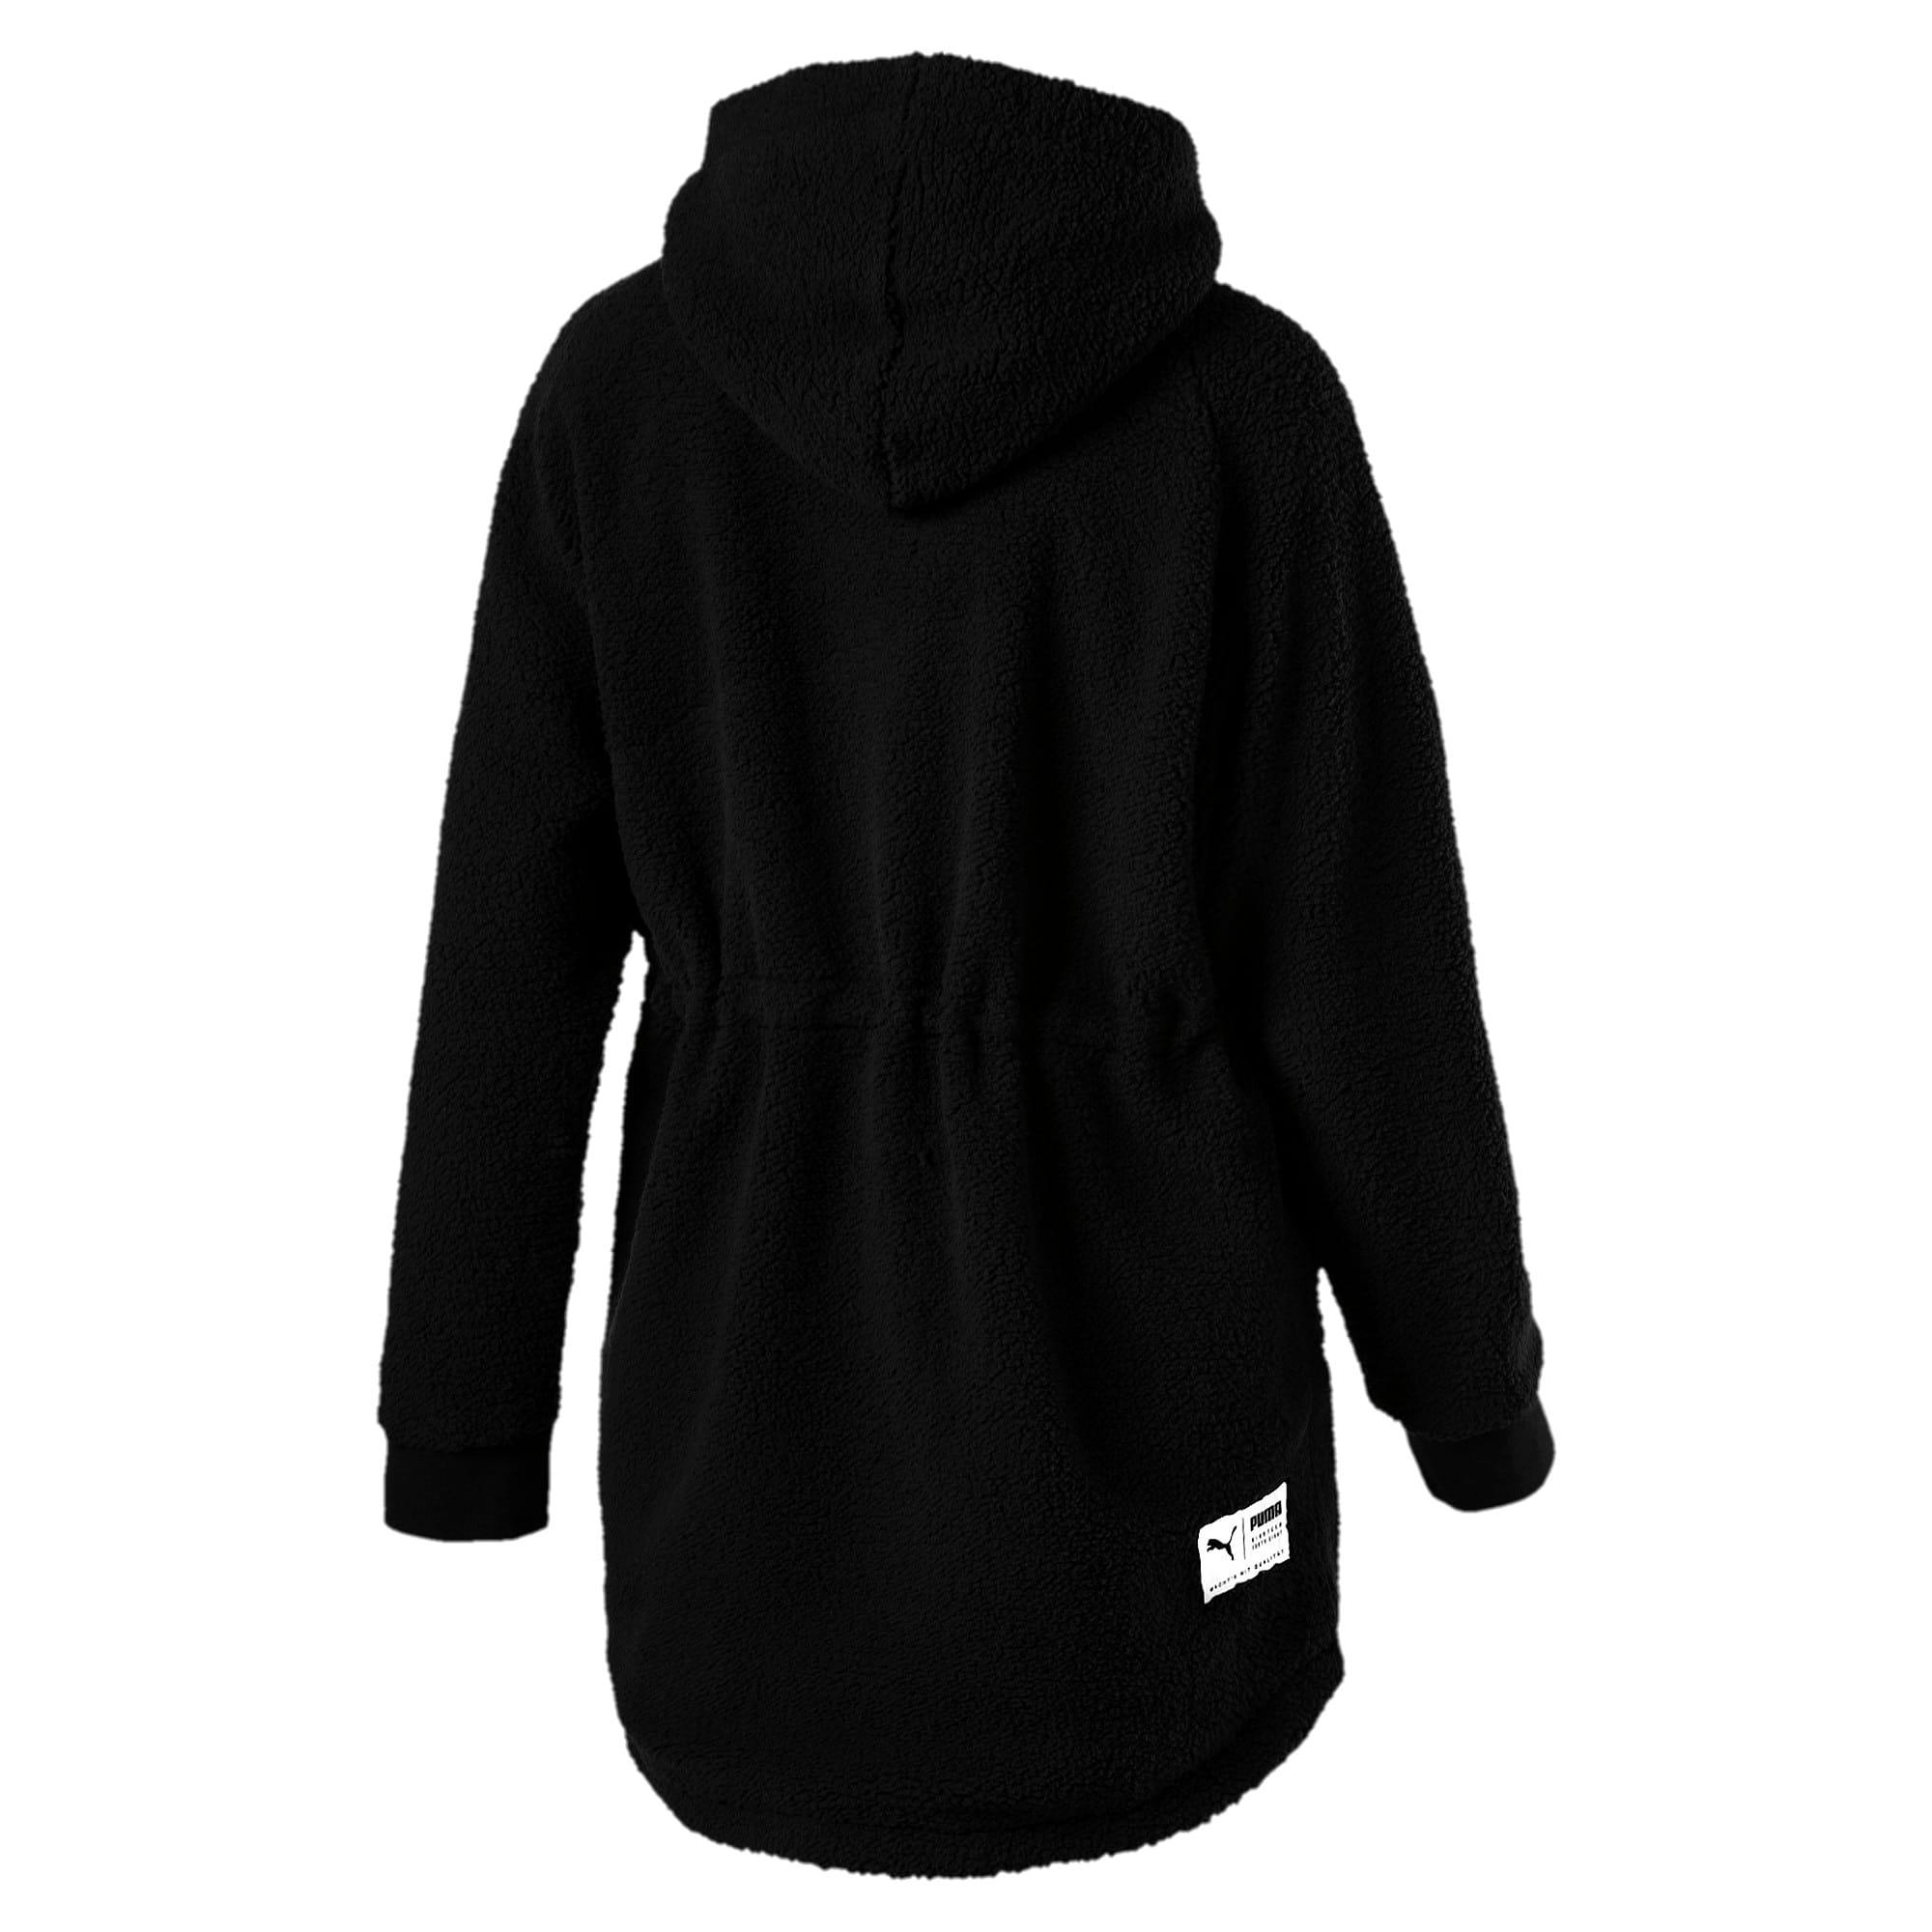 Thumbnail 3 of Downtown Winterised Full Zip Women's Sherpa Hoodie, Puma Black, medium